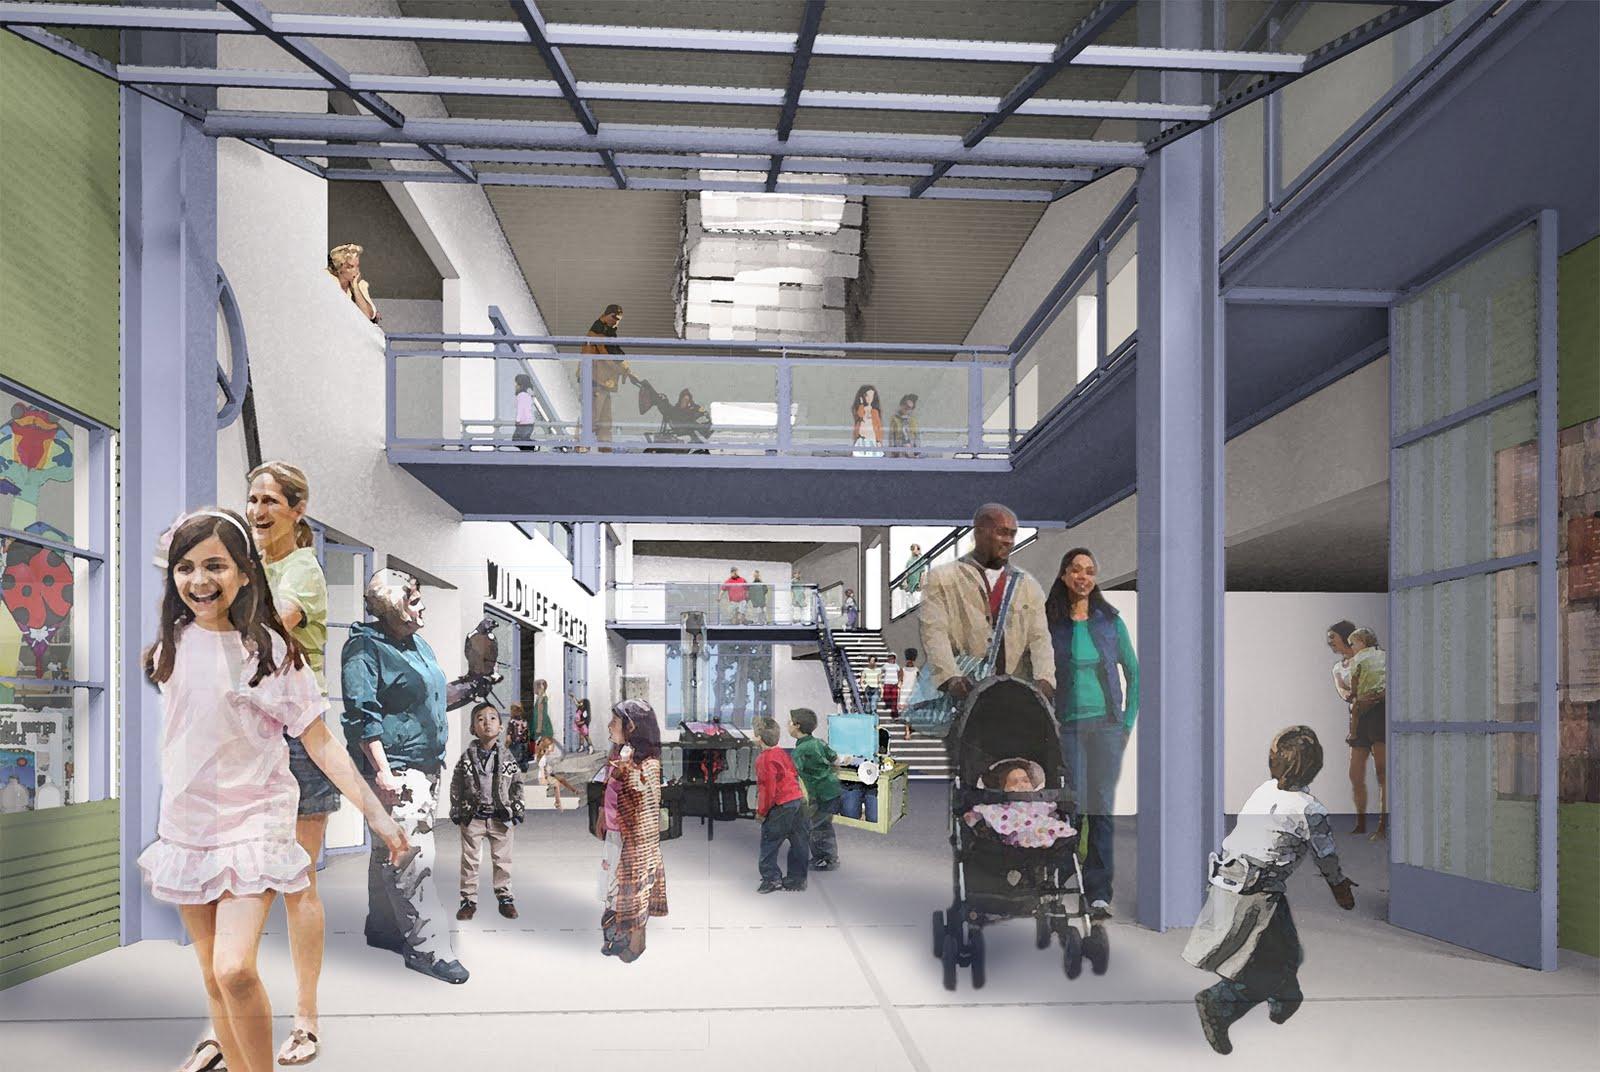 San Mateo Ca >> Fernau & Hartman Updates: CuriOdyssey: Conceptual Design Updates